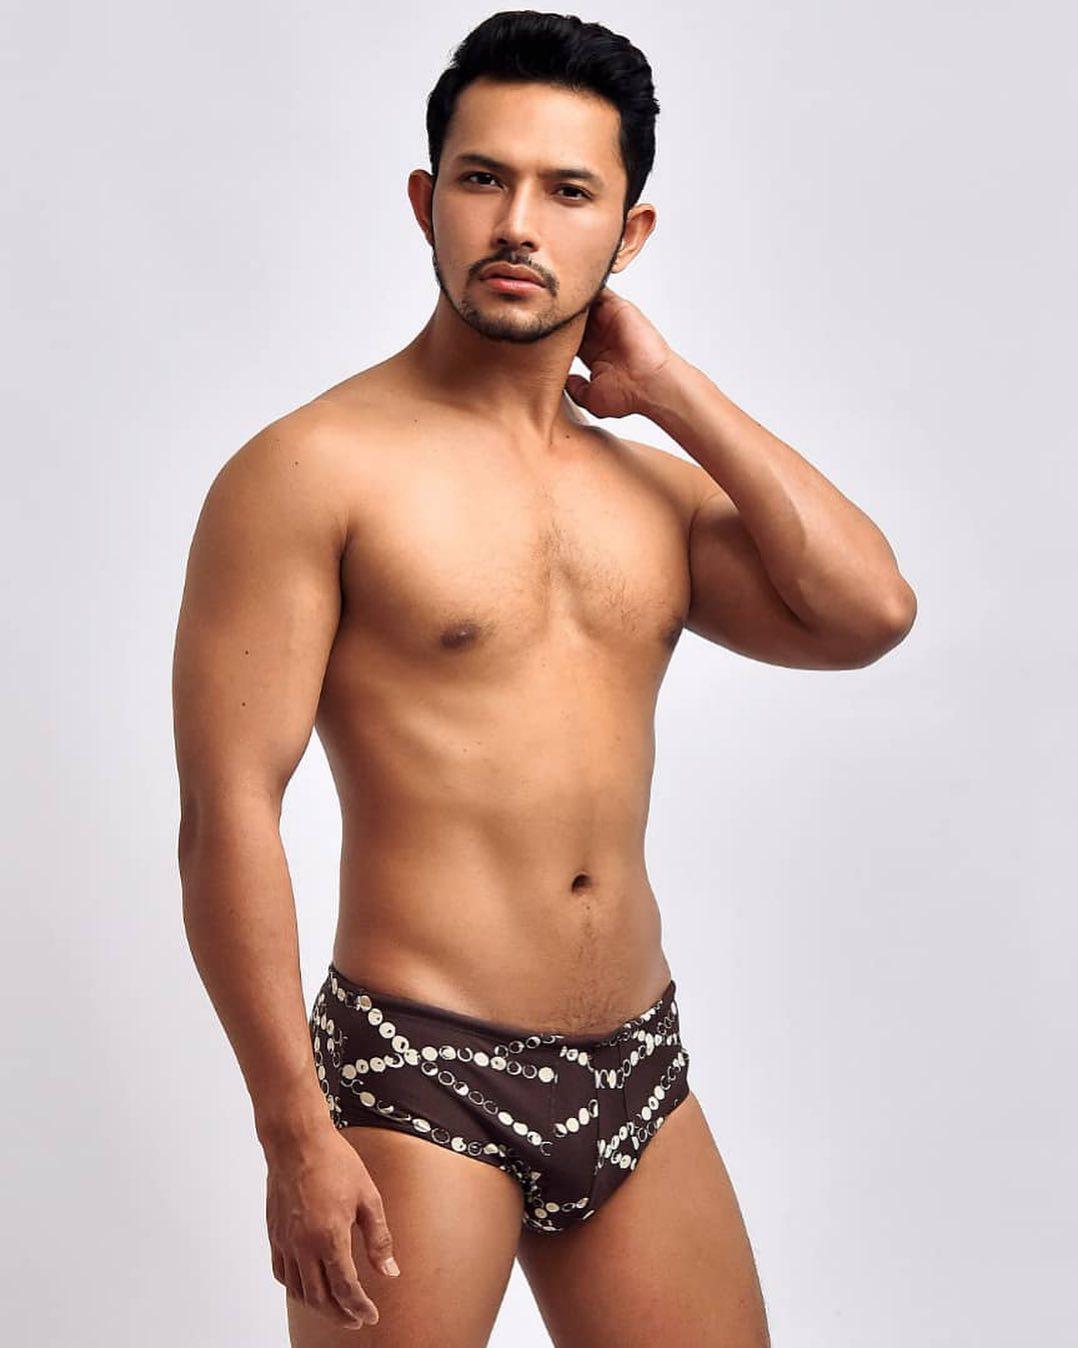 indonesia vence man of the earth 2021. 236541542_240782549_1268974536865622_704342983583970489_n-jpg-_nc_ht-scontent-gig2-1-cdnin